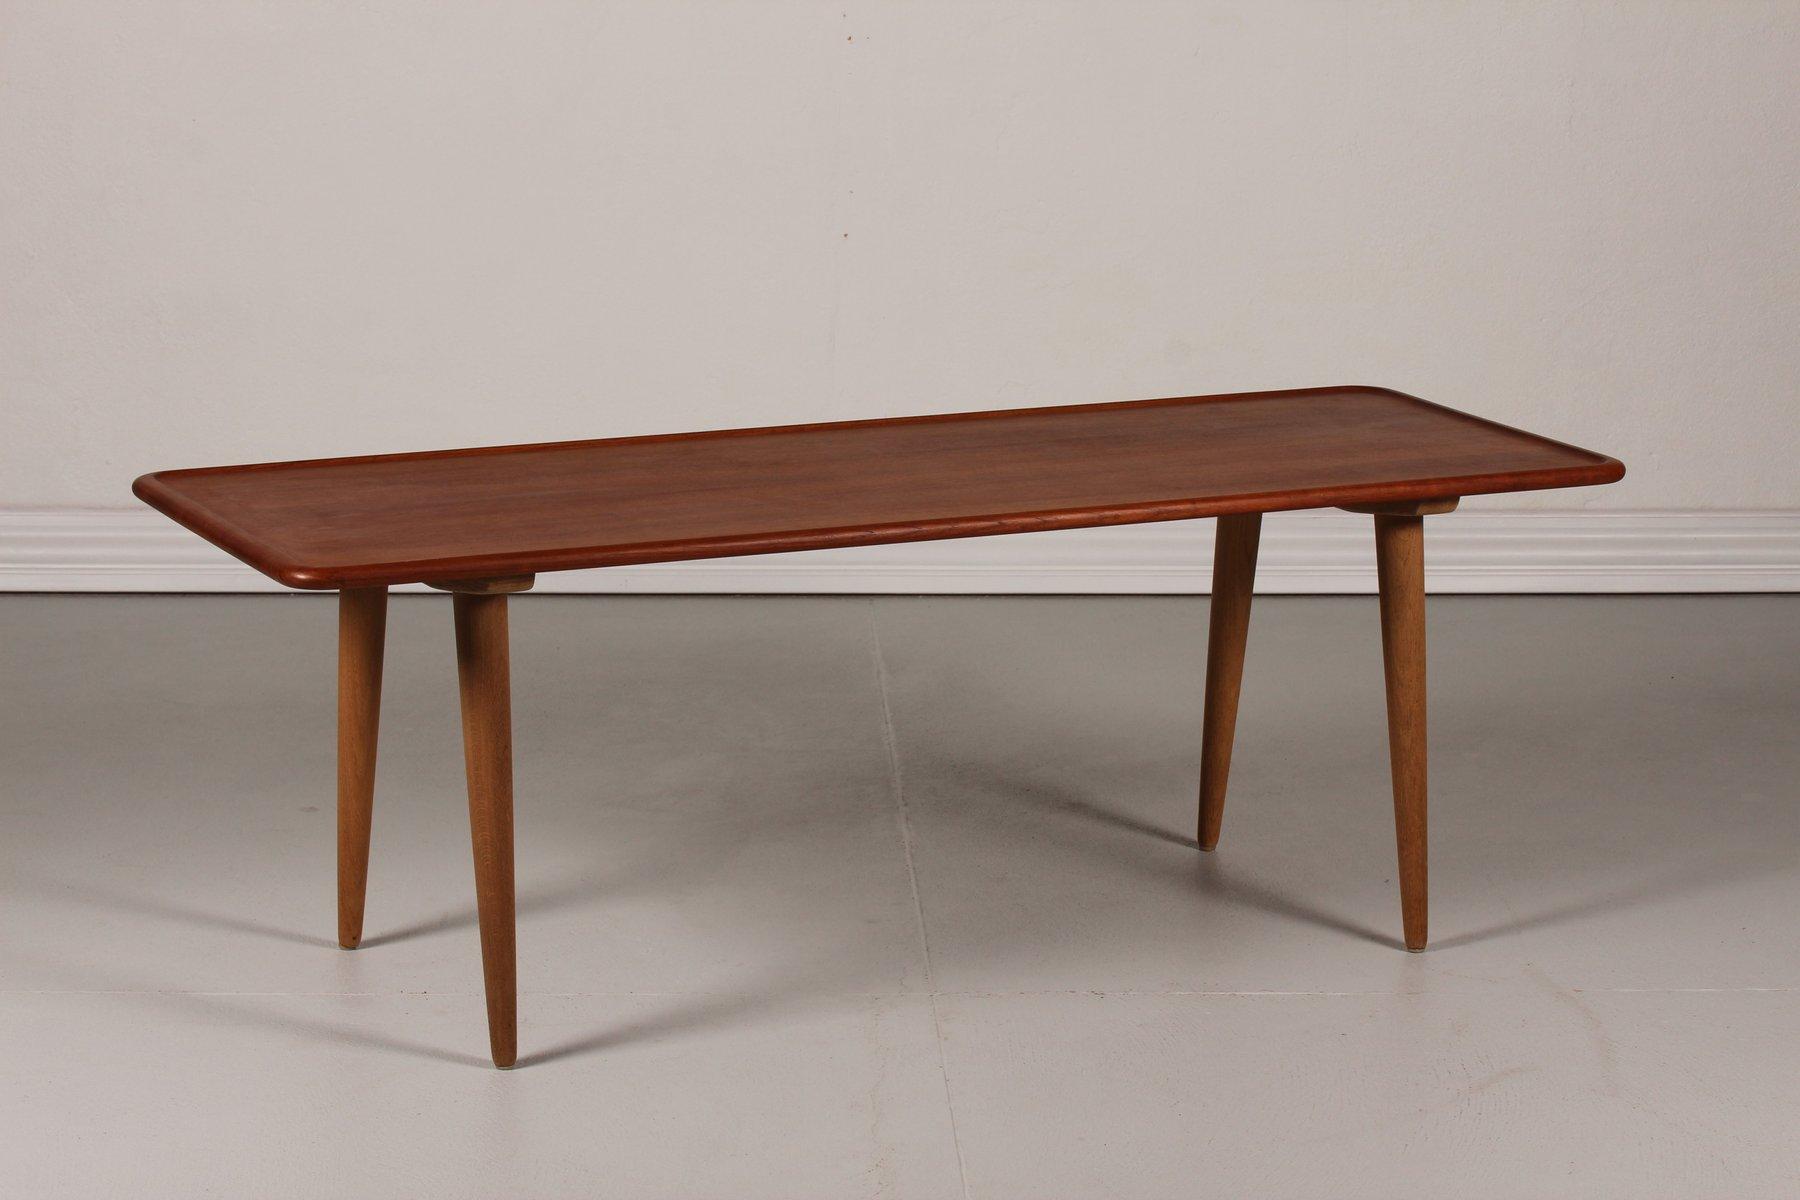 Danish At 11 Teak Coffee Table By Hans J Wegner For Andreas Tuck 1950s